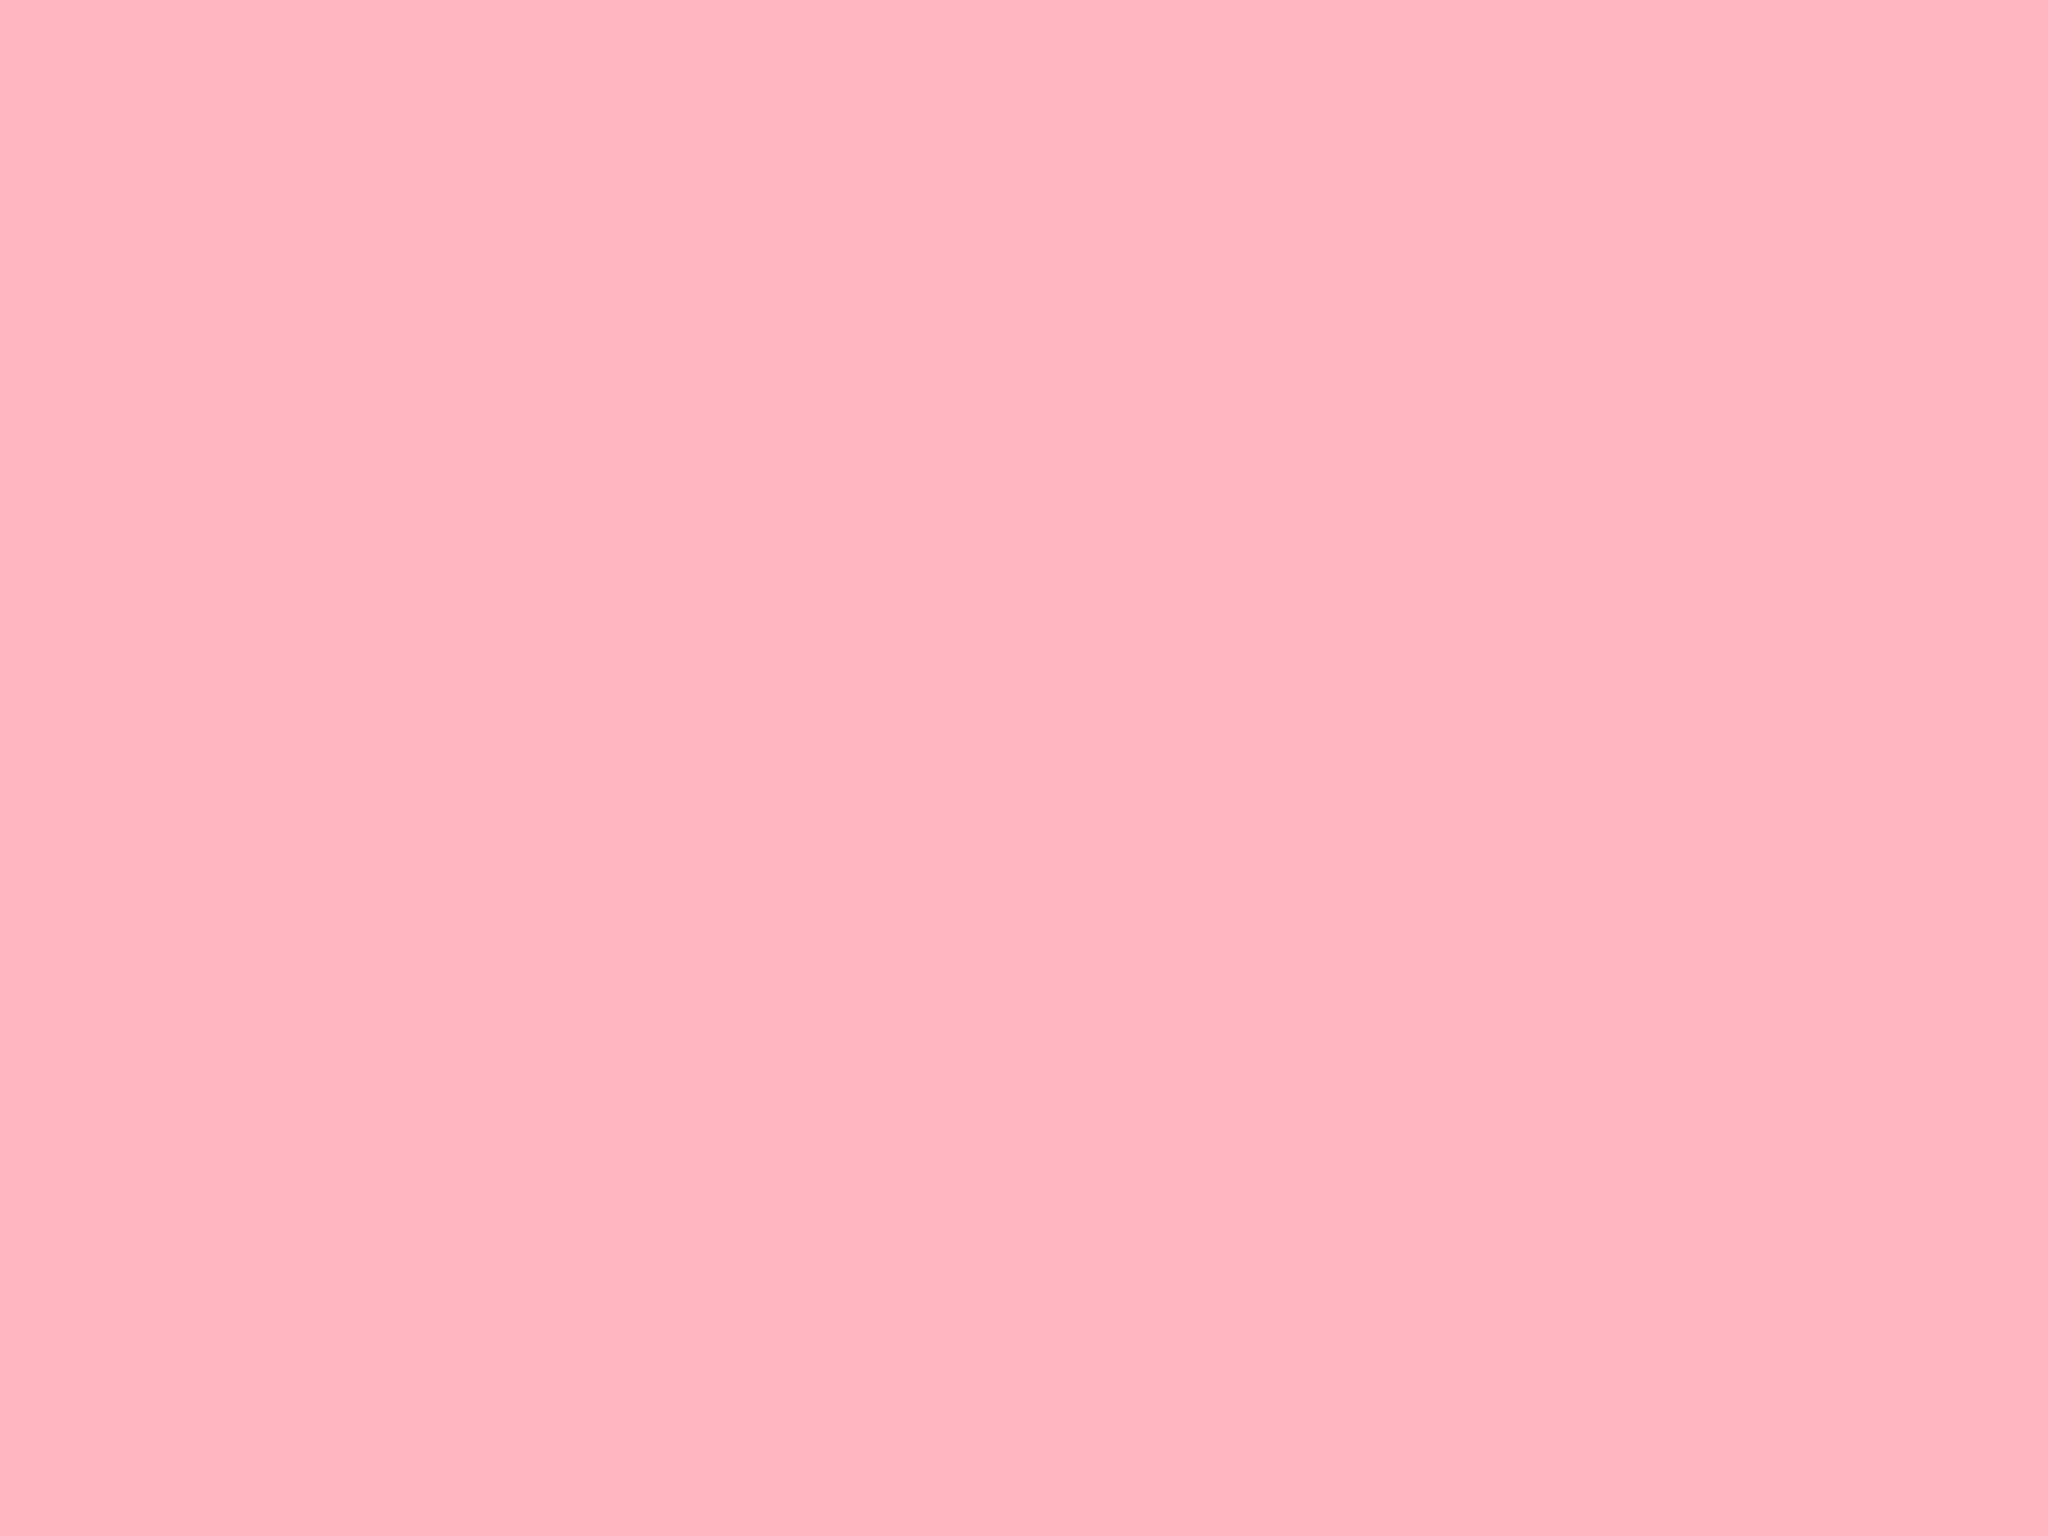 2048x1536 Light Pink Solid Color Background